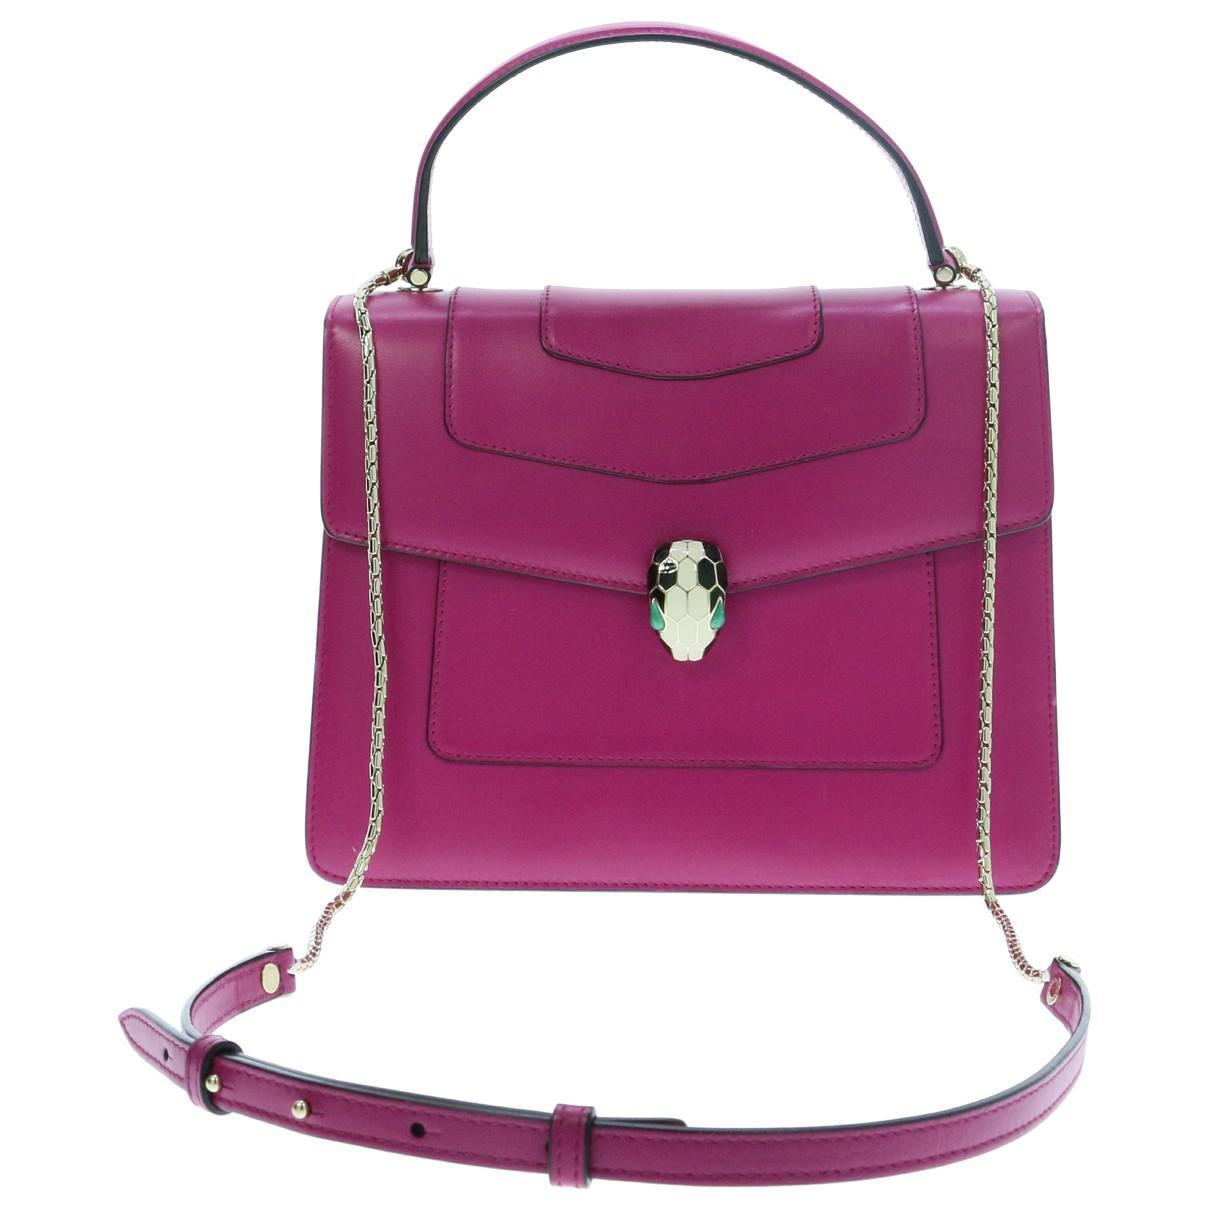 b74bdb030c93 Lyst - Bvlgari Pre-owned Serpenti Leather Handbag in Pink